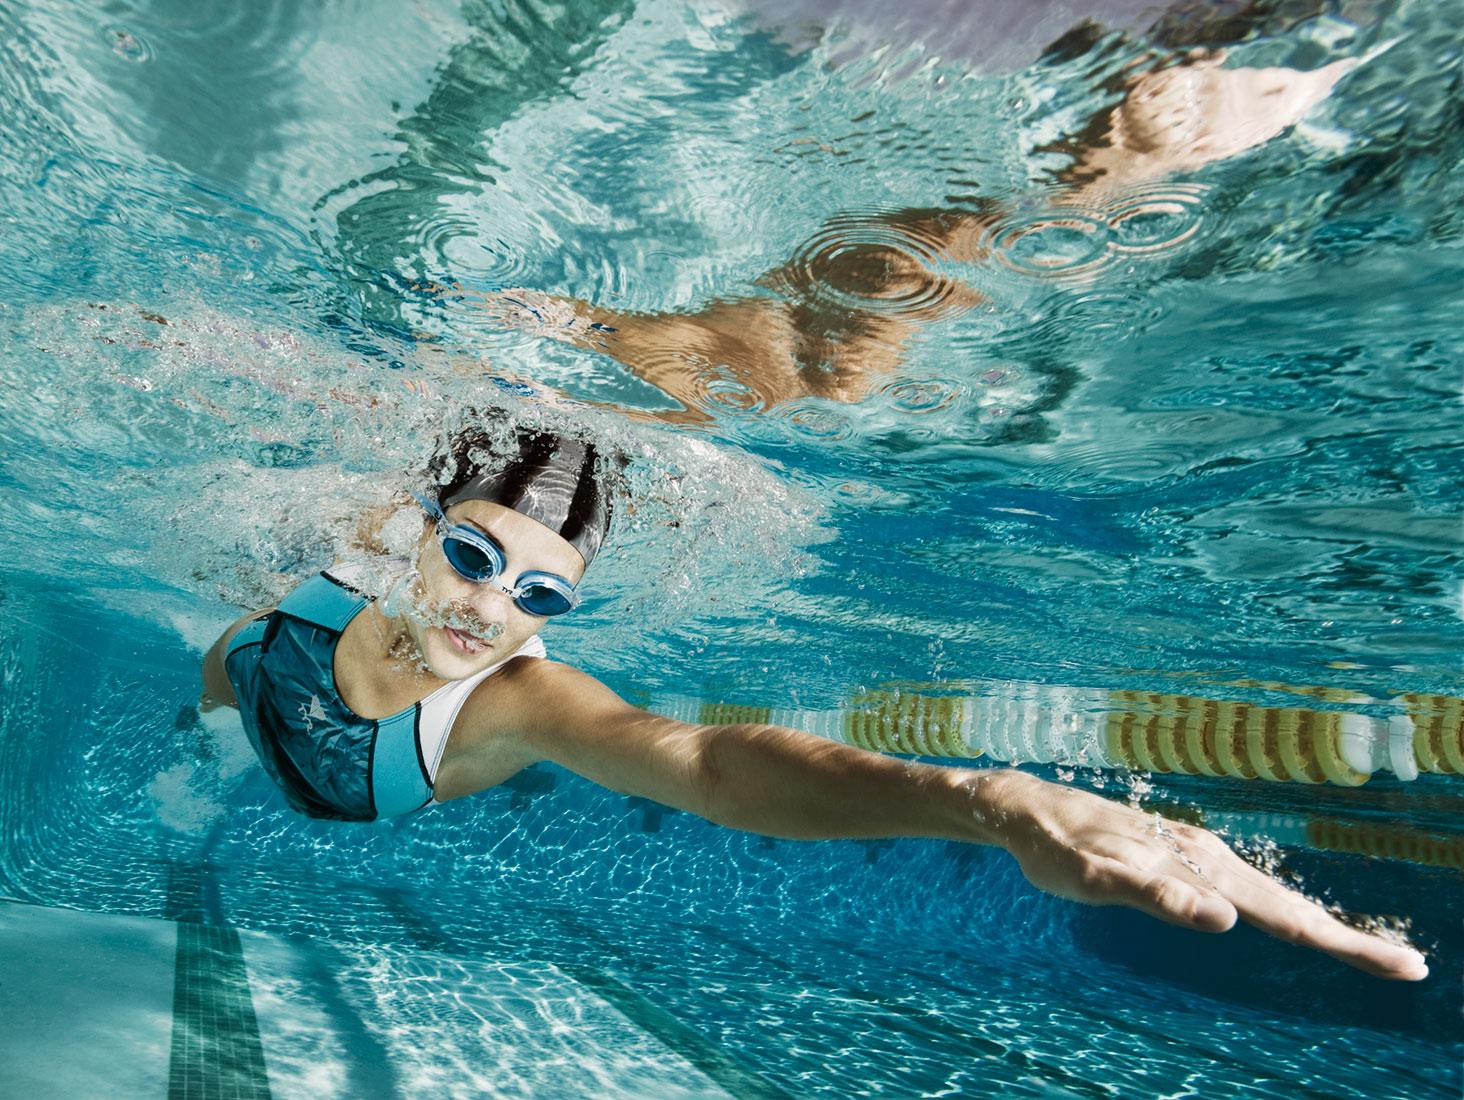 af2b15f4ddc Βασικός Εξοπλισμός για Κολύμβηση | Θουκυδίδειος Οργανισμός ...